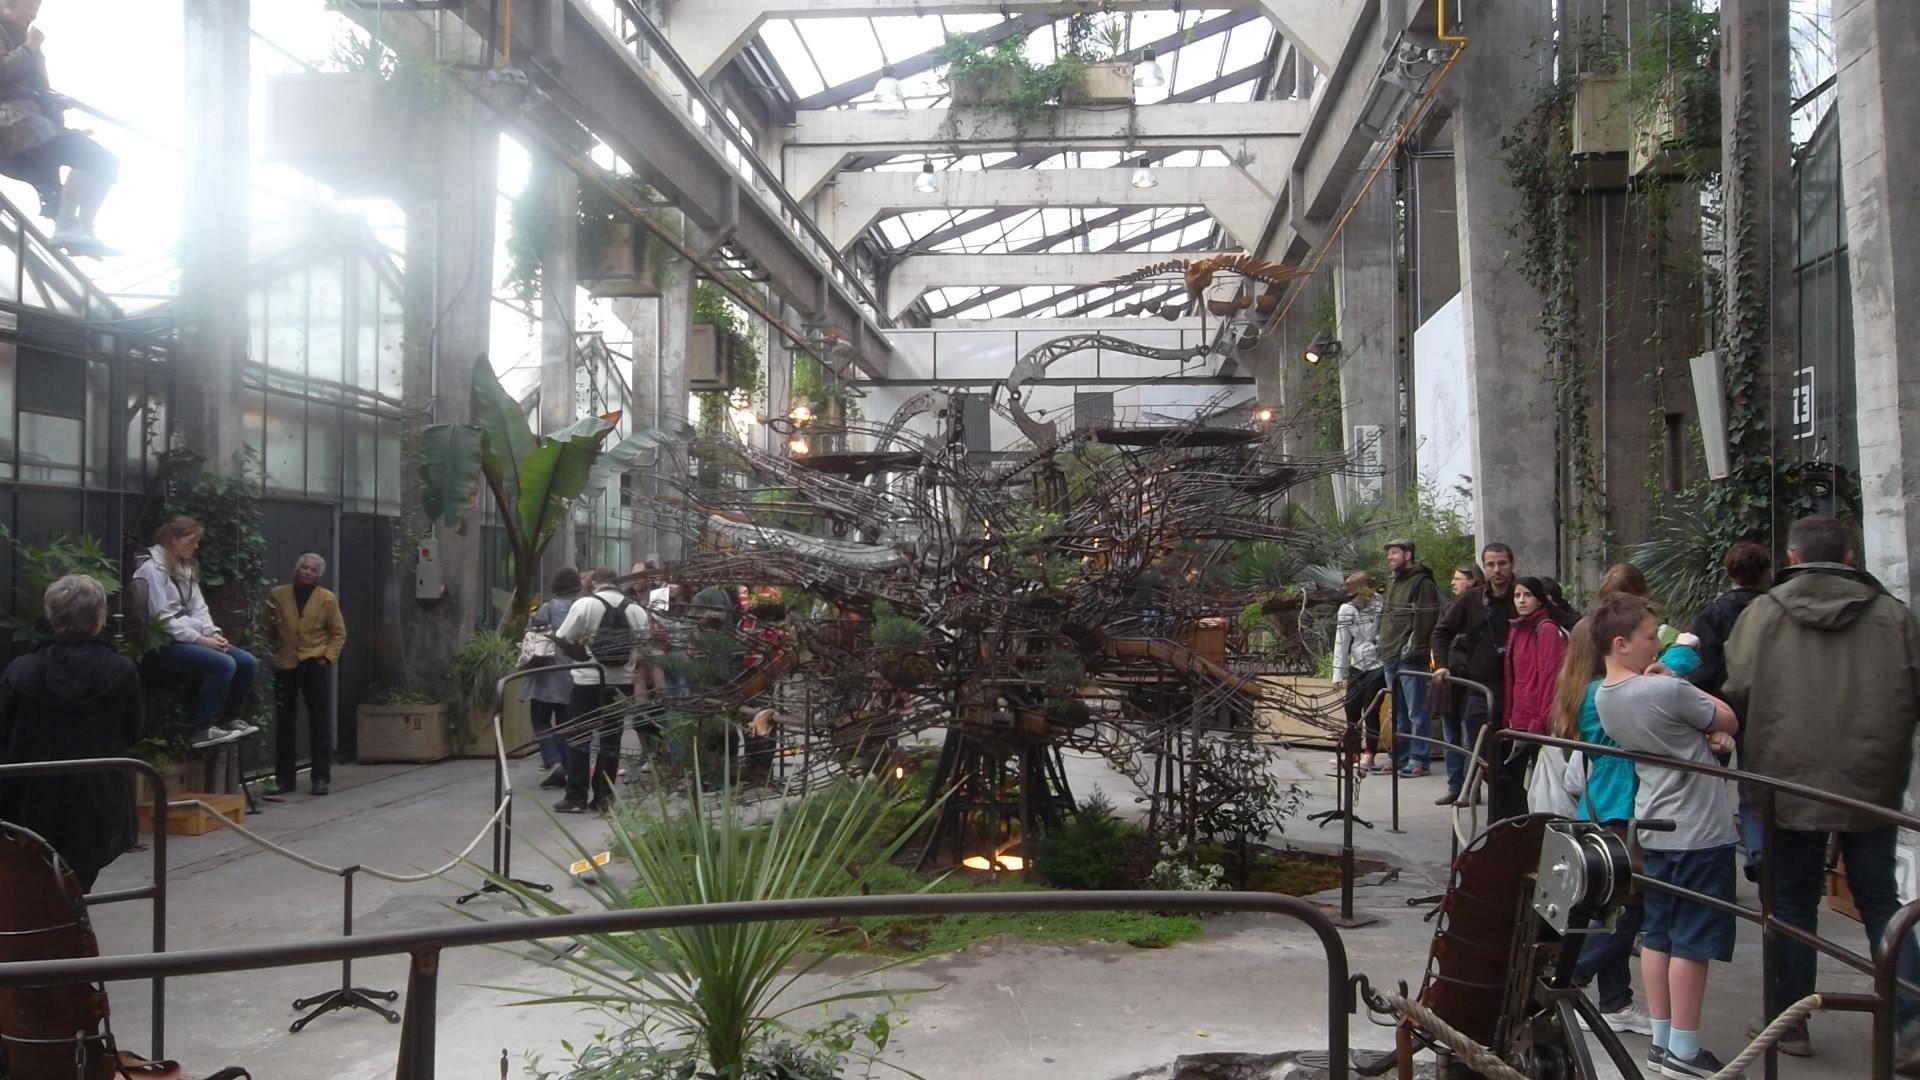 nantes-galerie-des-machines-hall-my13